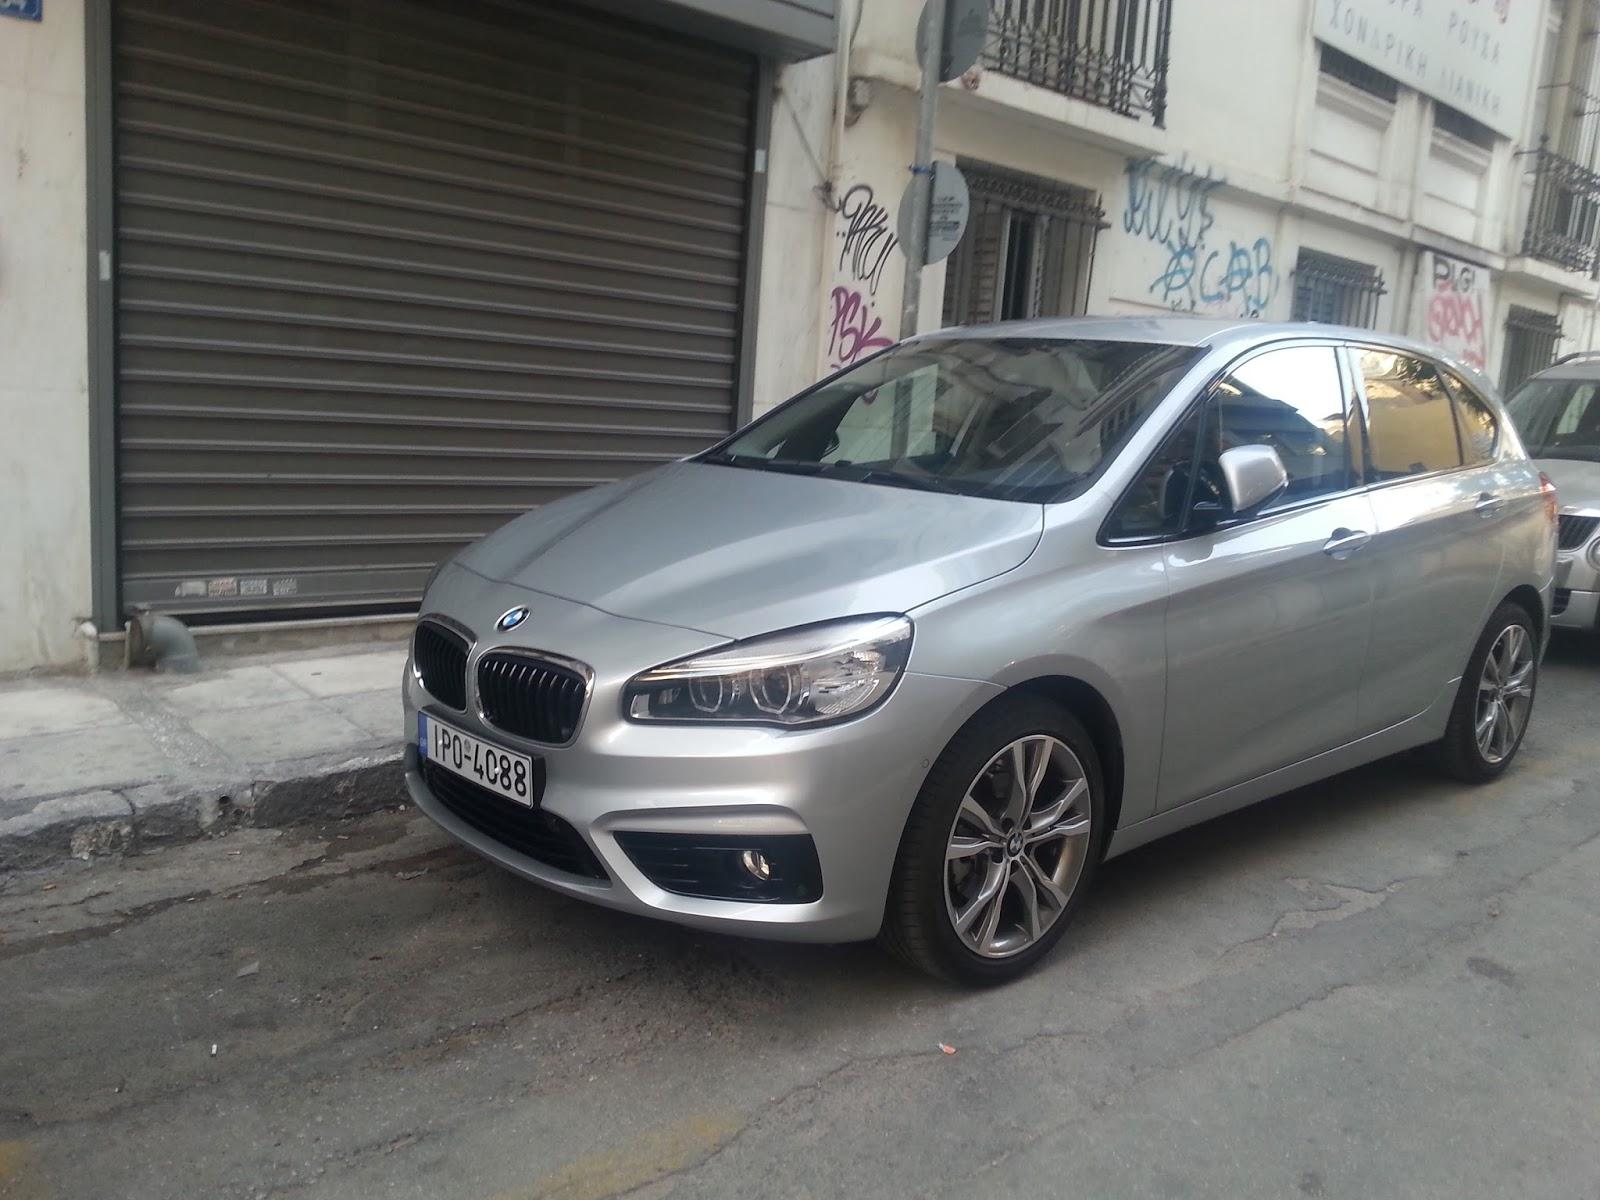 f1 Τα 10 καλύτερα αυτοκίνητα για νέες μαμάδες topspeed.gr, zblog, μαμάδες, μητέρες, μωρά